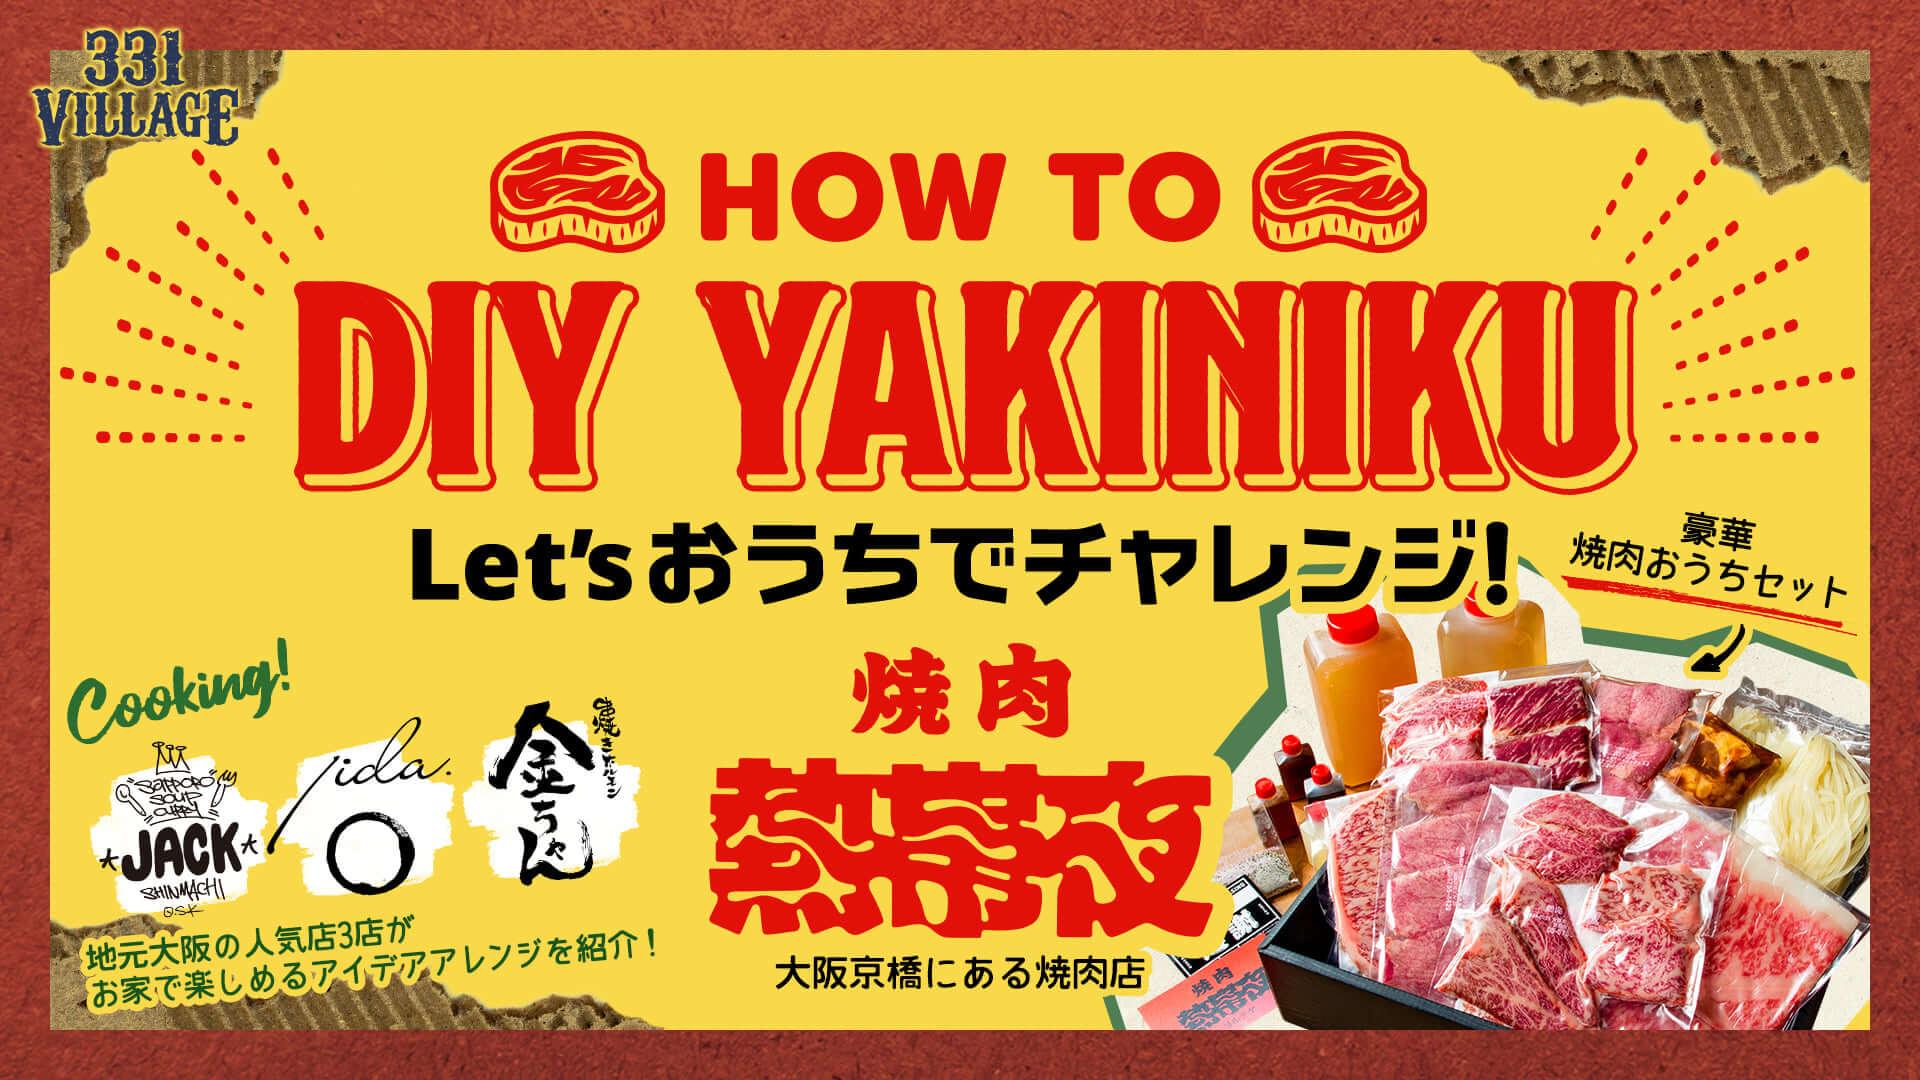 Moment Tokyo主催デジタルフェス<331VILLAGE>の第1弾ラインナップが発表|TAAR、Kotsu、Kamui、Yohji Igarashiなど music200525_311village_lineup_1-1920x1080